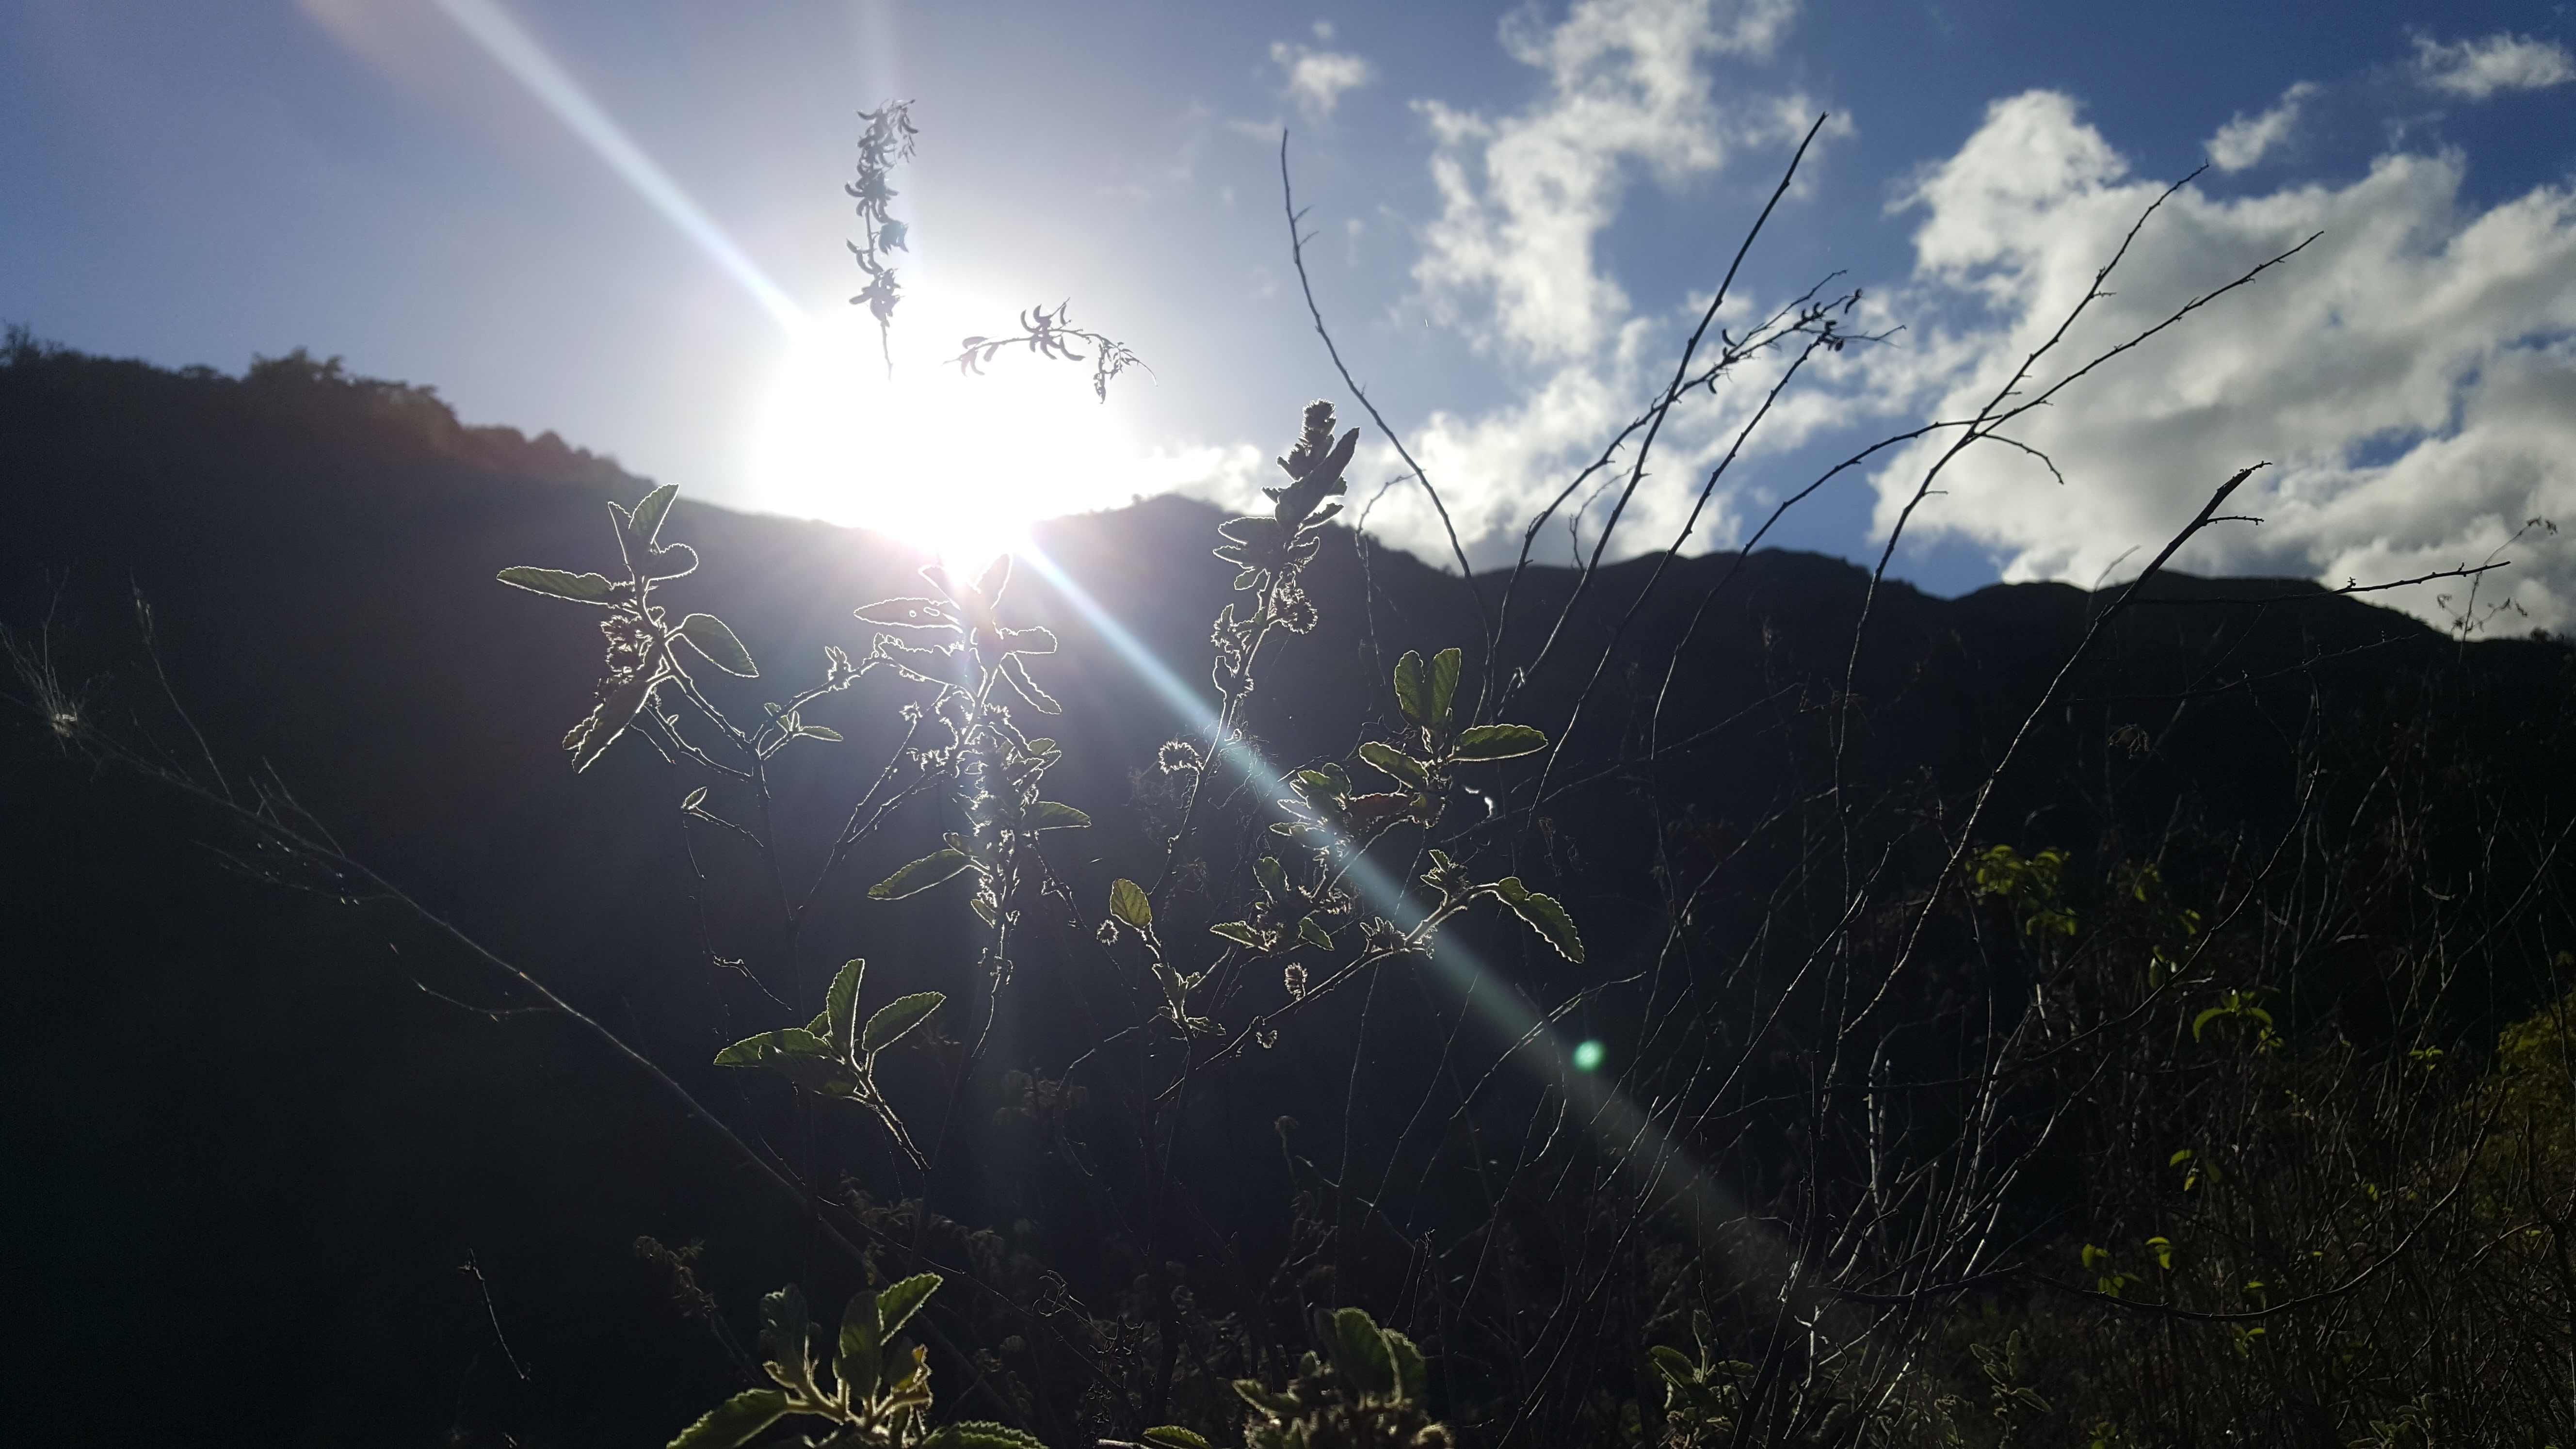 https://tahititourisme.com.br/wp-content/uploads/2020/09/20180519_074342.jpg